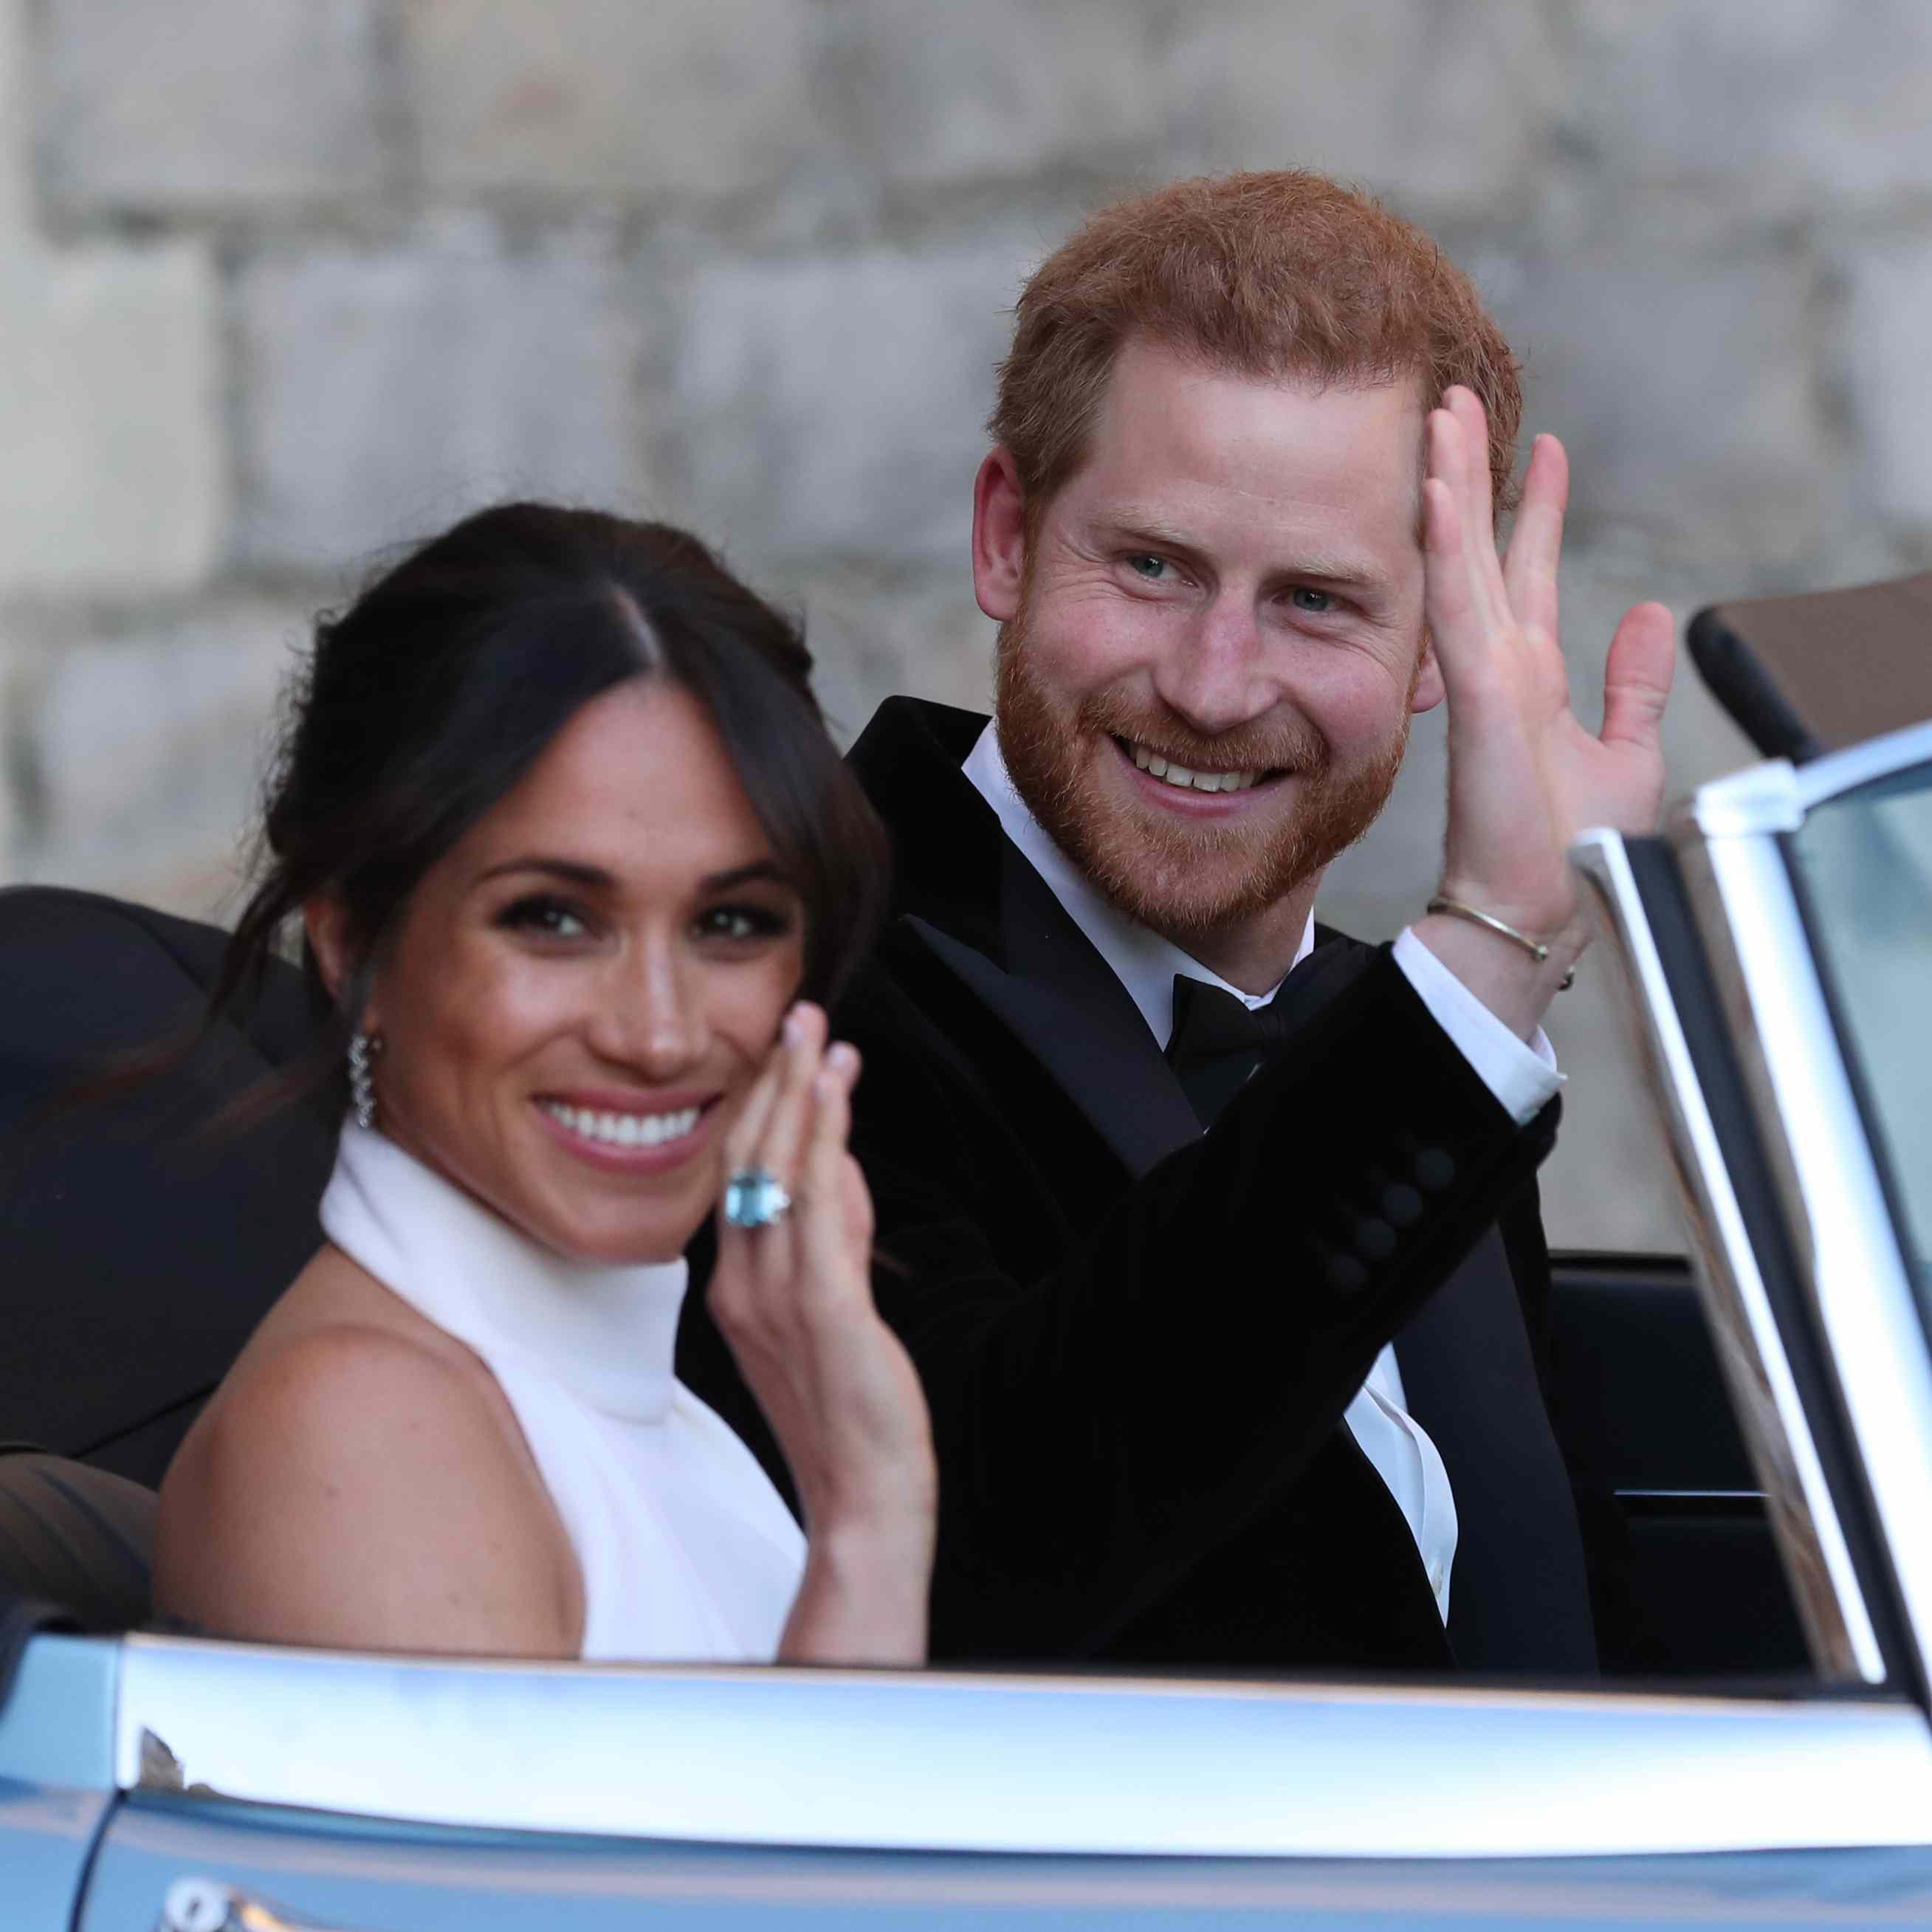 Royal Wedding Meghan Markle.Meghan Markle And Prince Harry Share Never Before Seen Royal